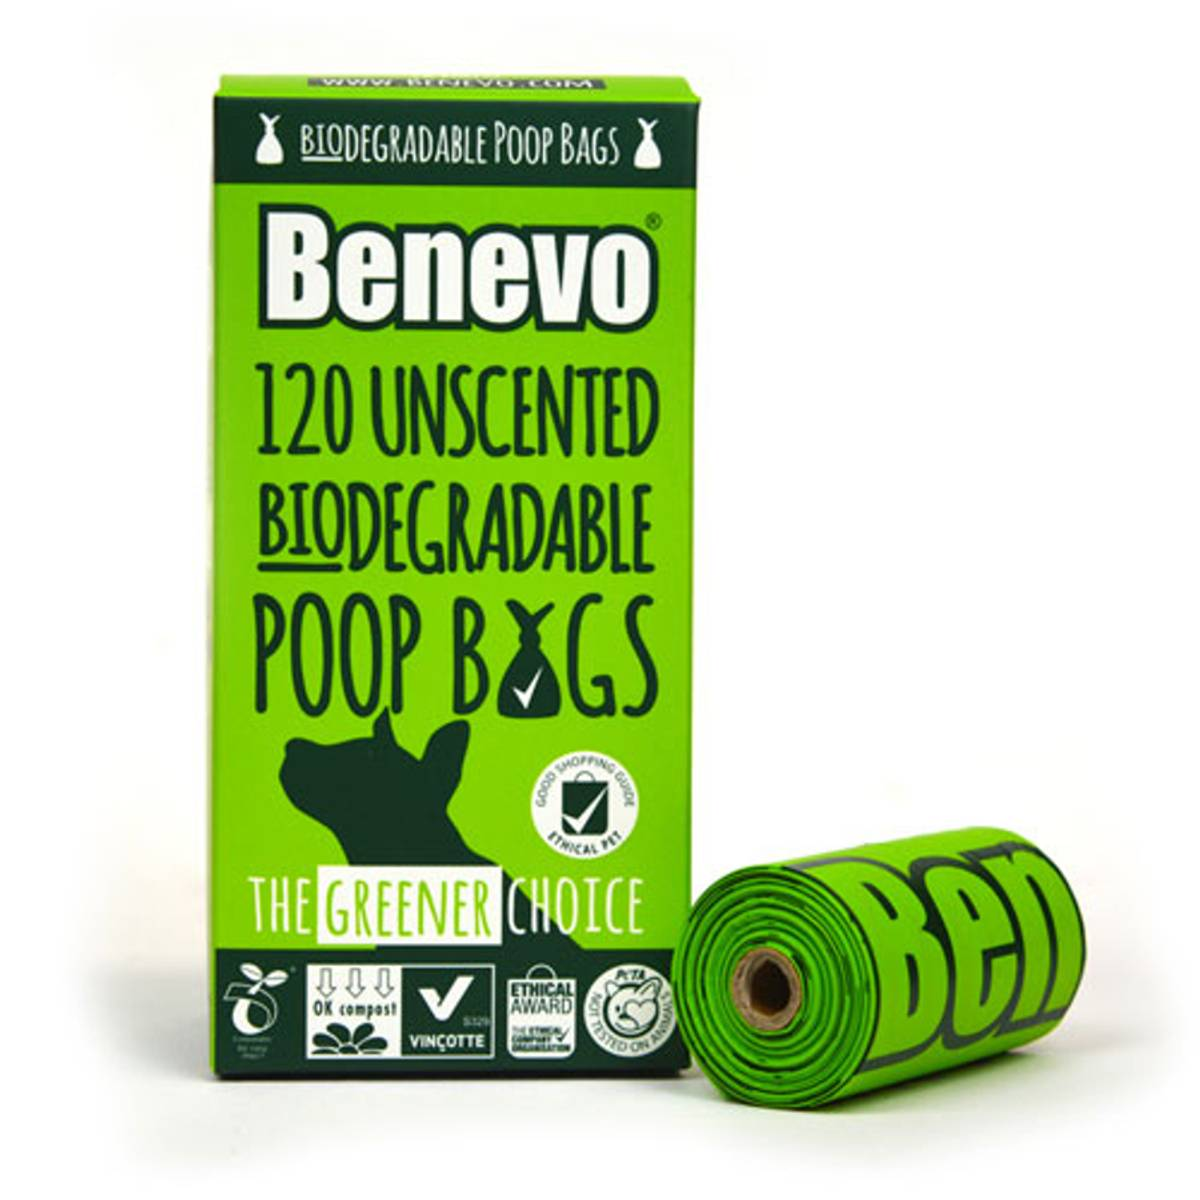 Nedbrytbare hundeposer 120stk / Benevo